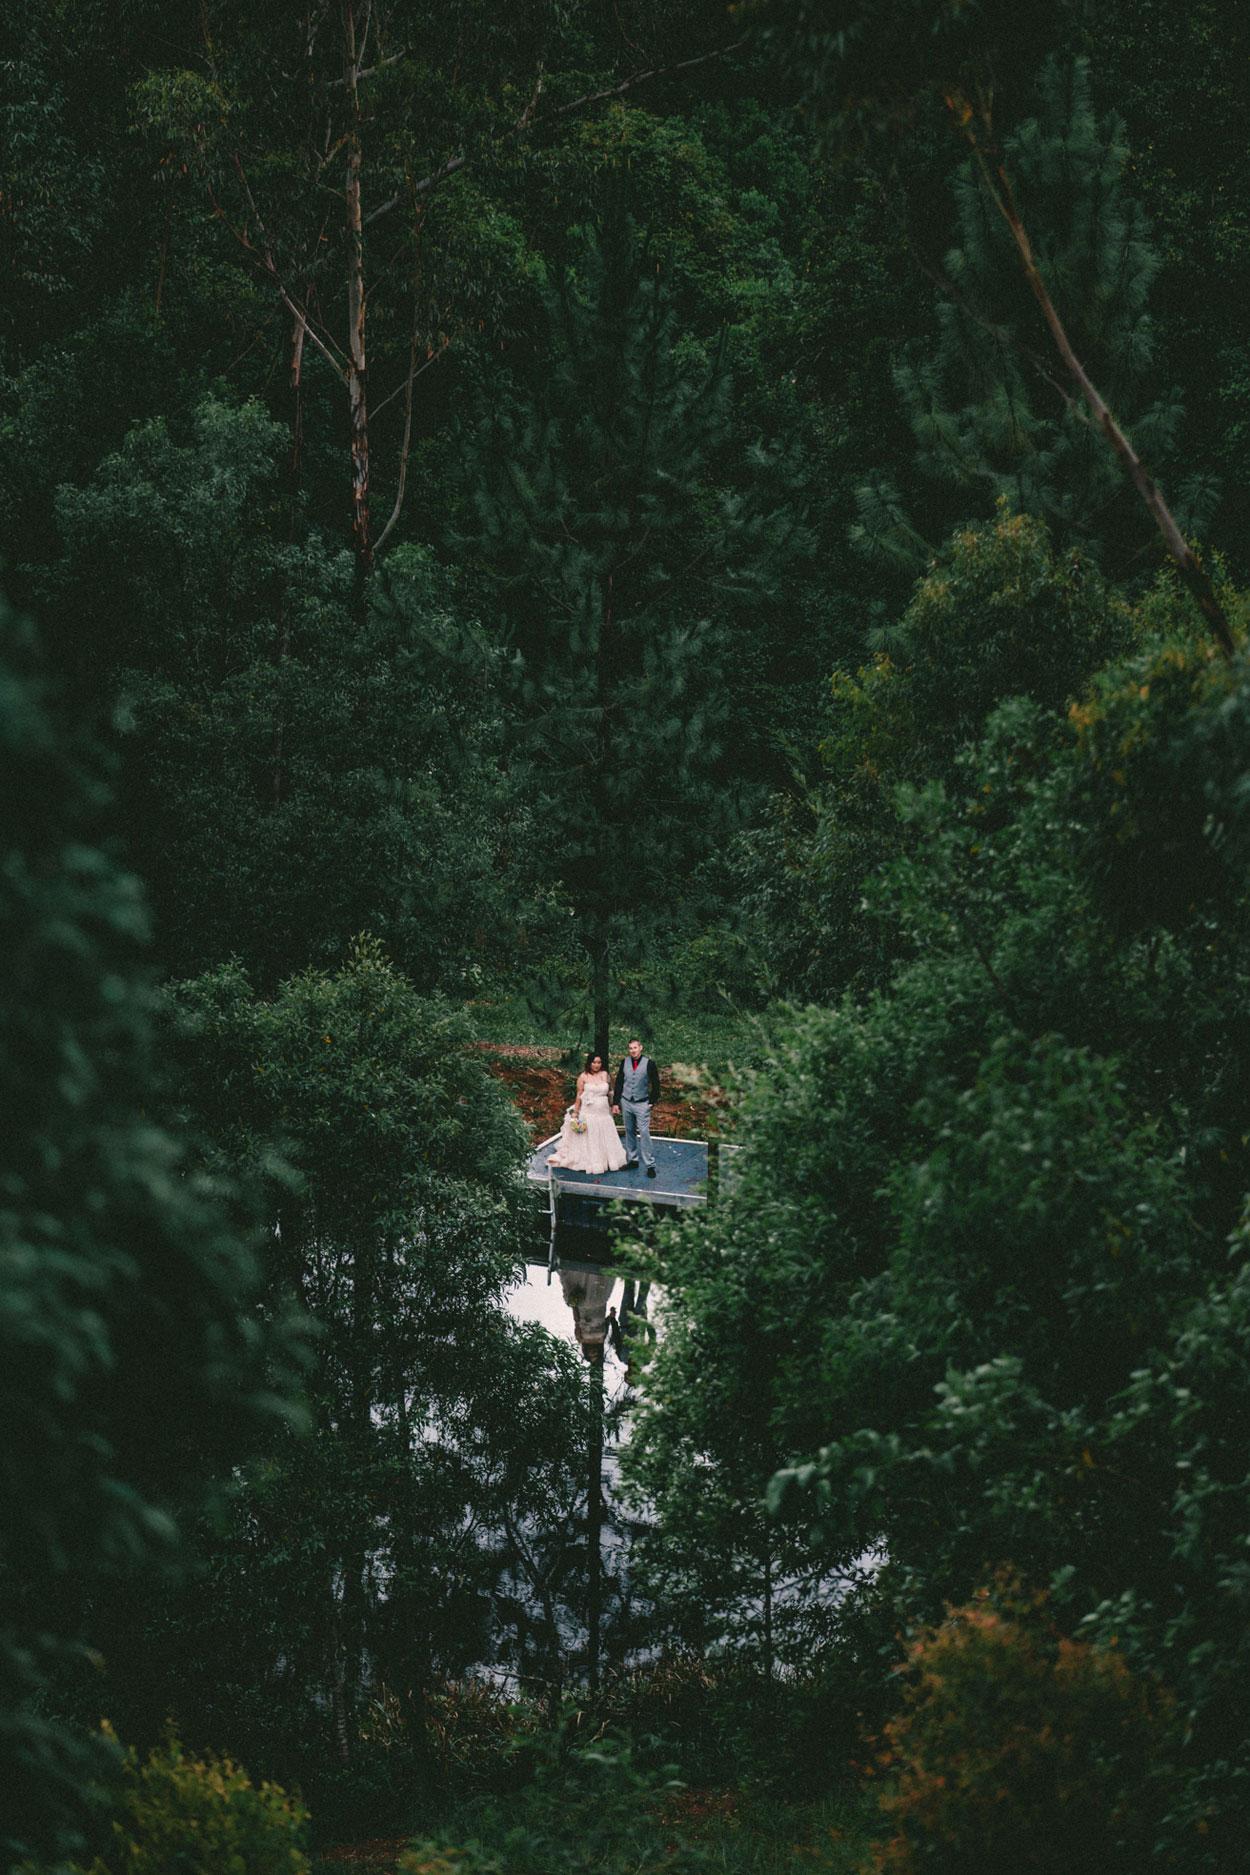 Sunshine-coast-wedding-photographers-noosa-maleny-flaxton-mapleton-montville-hinterland-coolum-mooloolaba-maroochydore-caloundra-beach-elopement-eco-friendly-best-photos-83.jpg